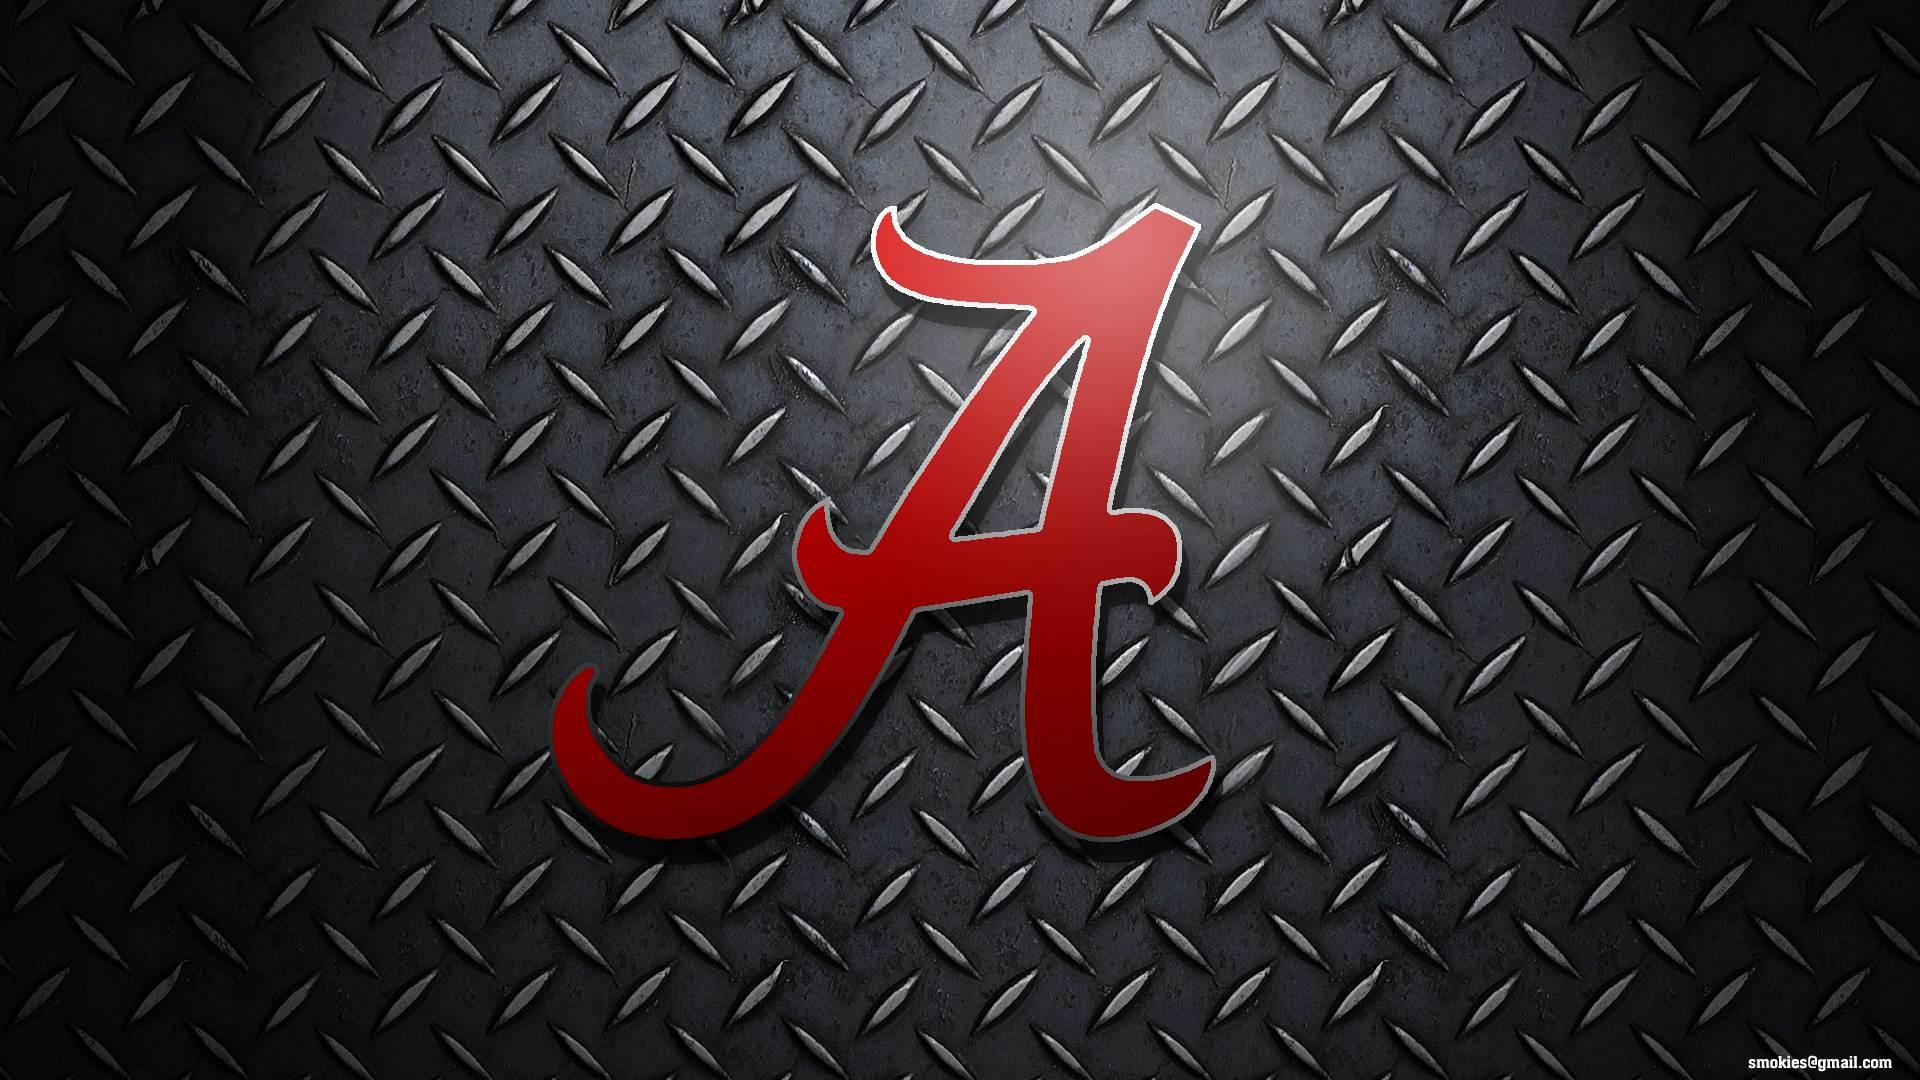 Alabama Crimson Tide Logo Wallpapers   Wallpaper Cave. Alabama Football Wallpapers 2016   Wallpaper Cave